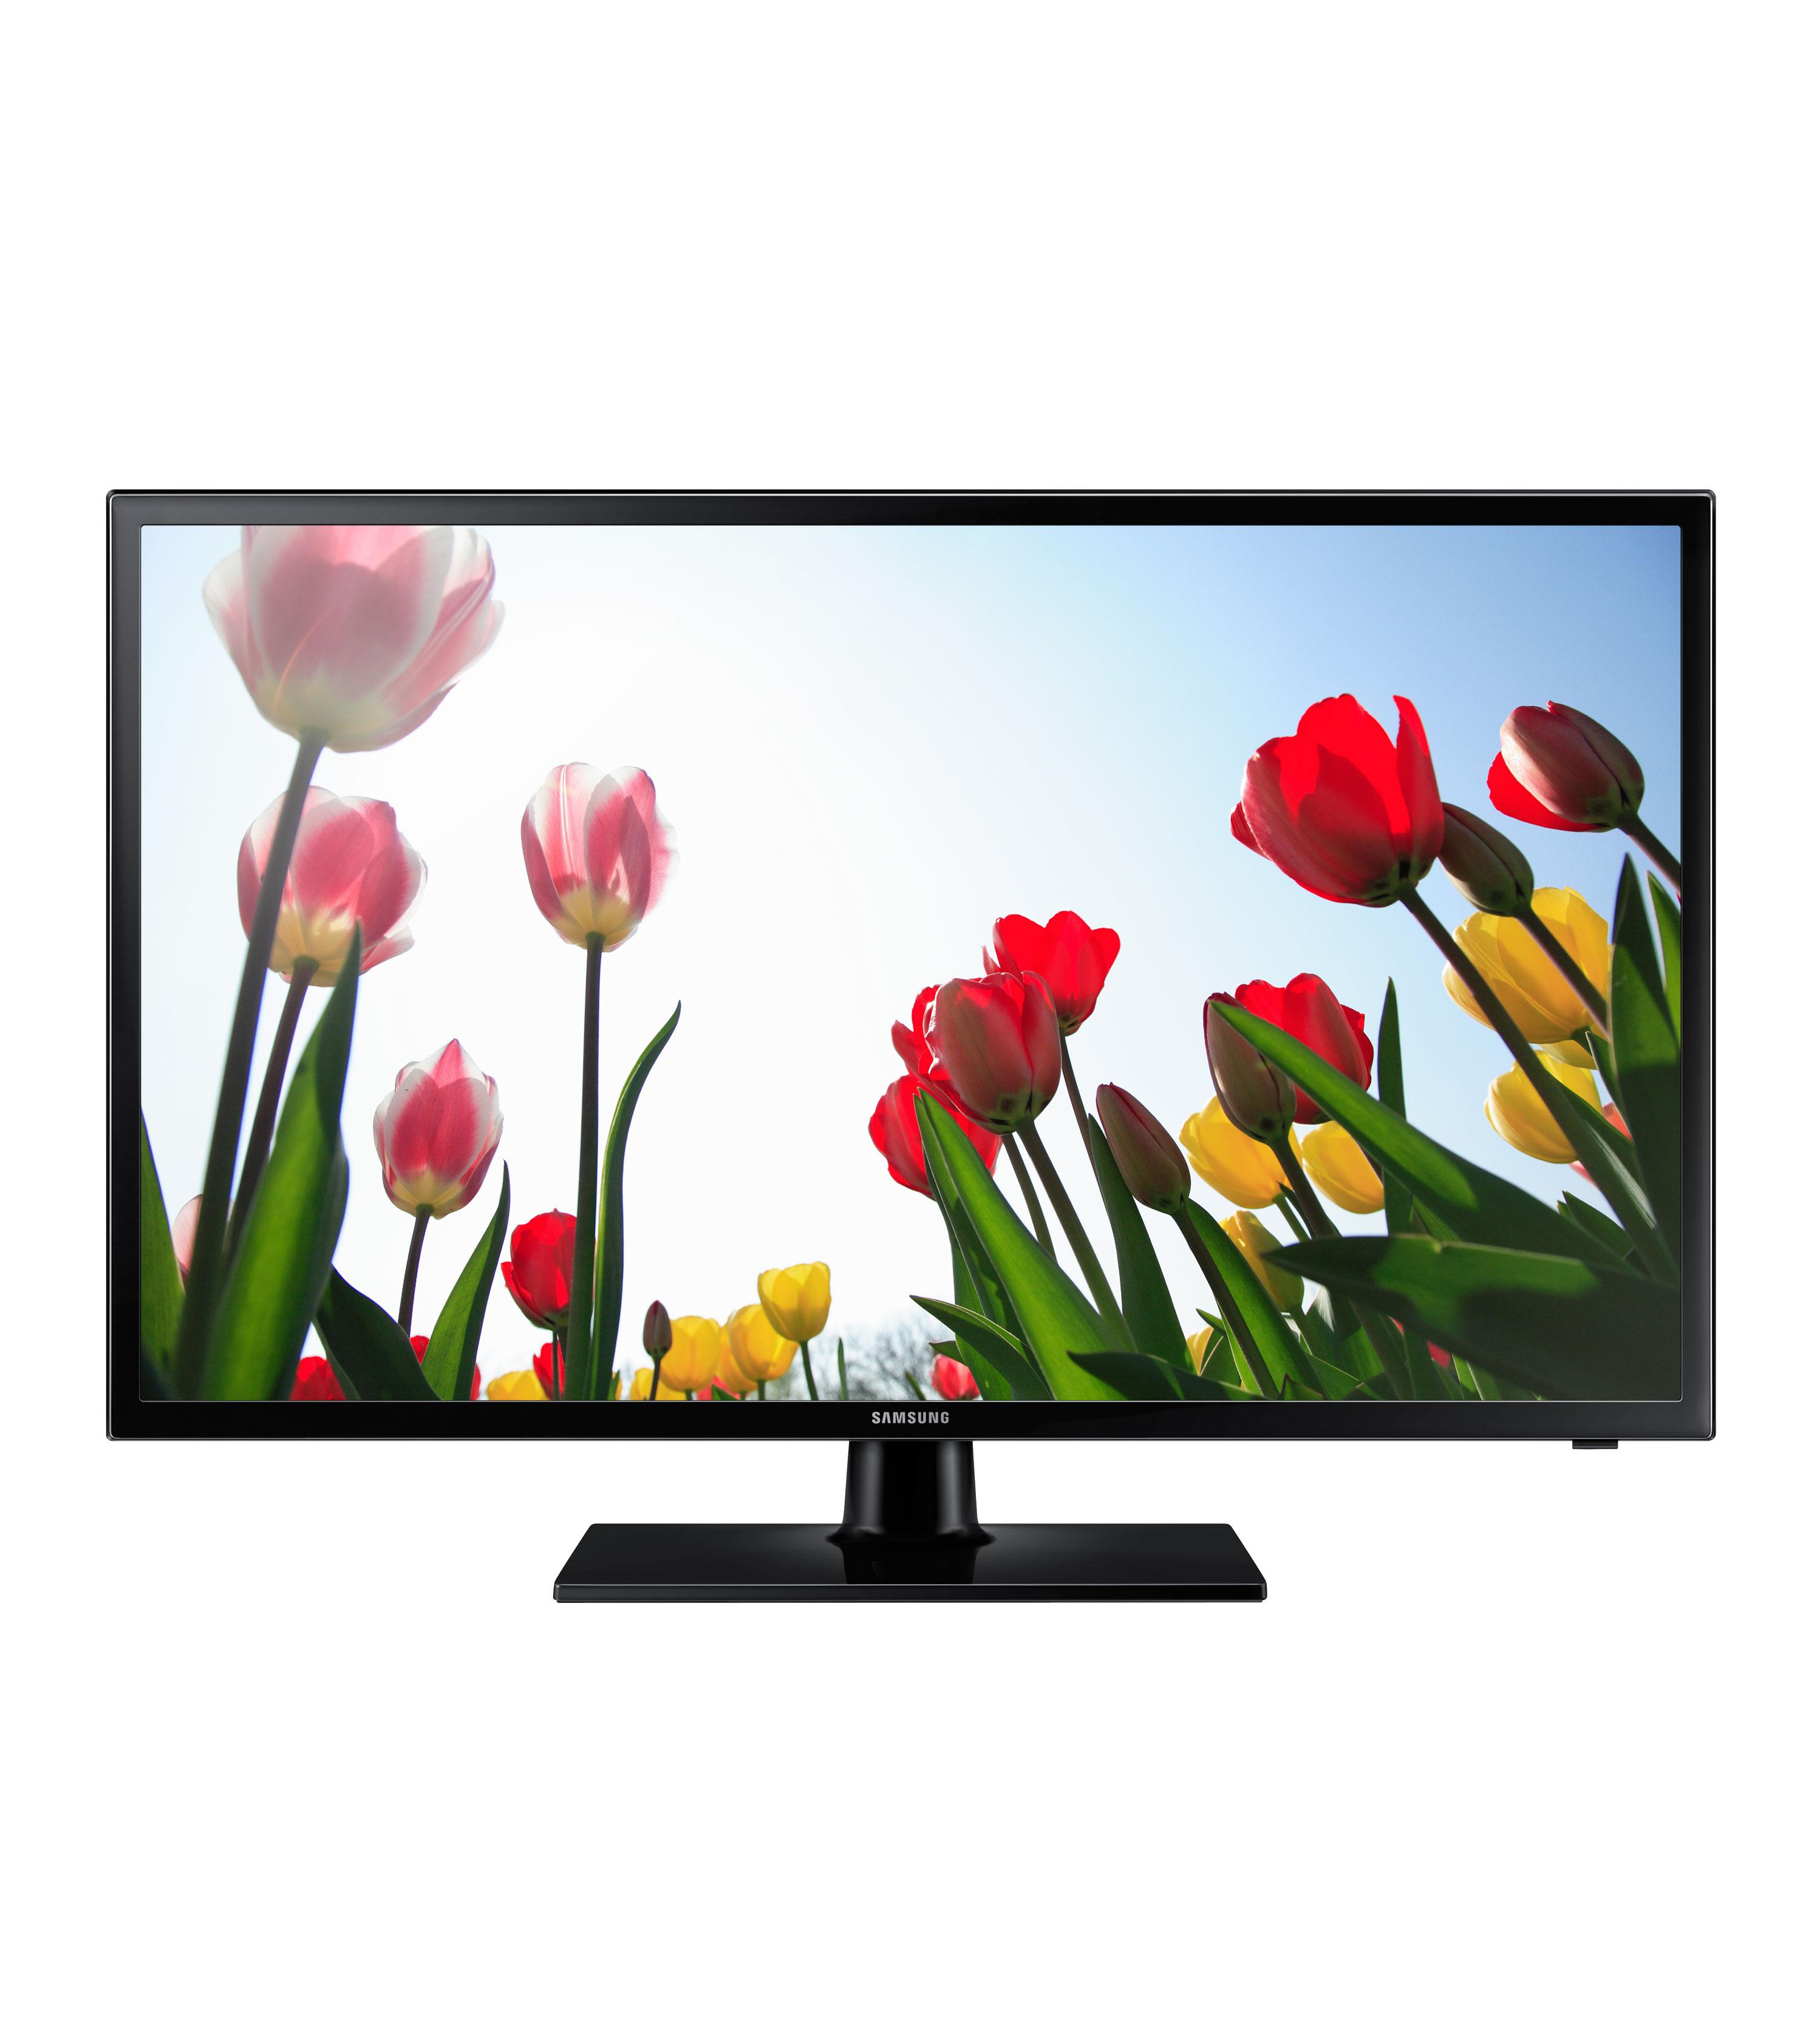 纤薄LED液晶电视 UA32F4088ARXXZ